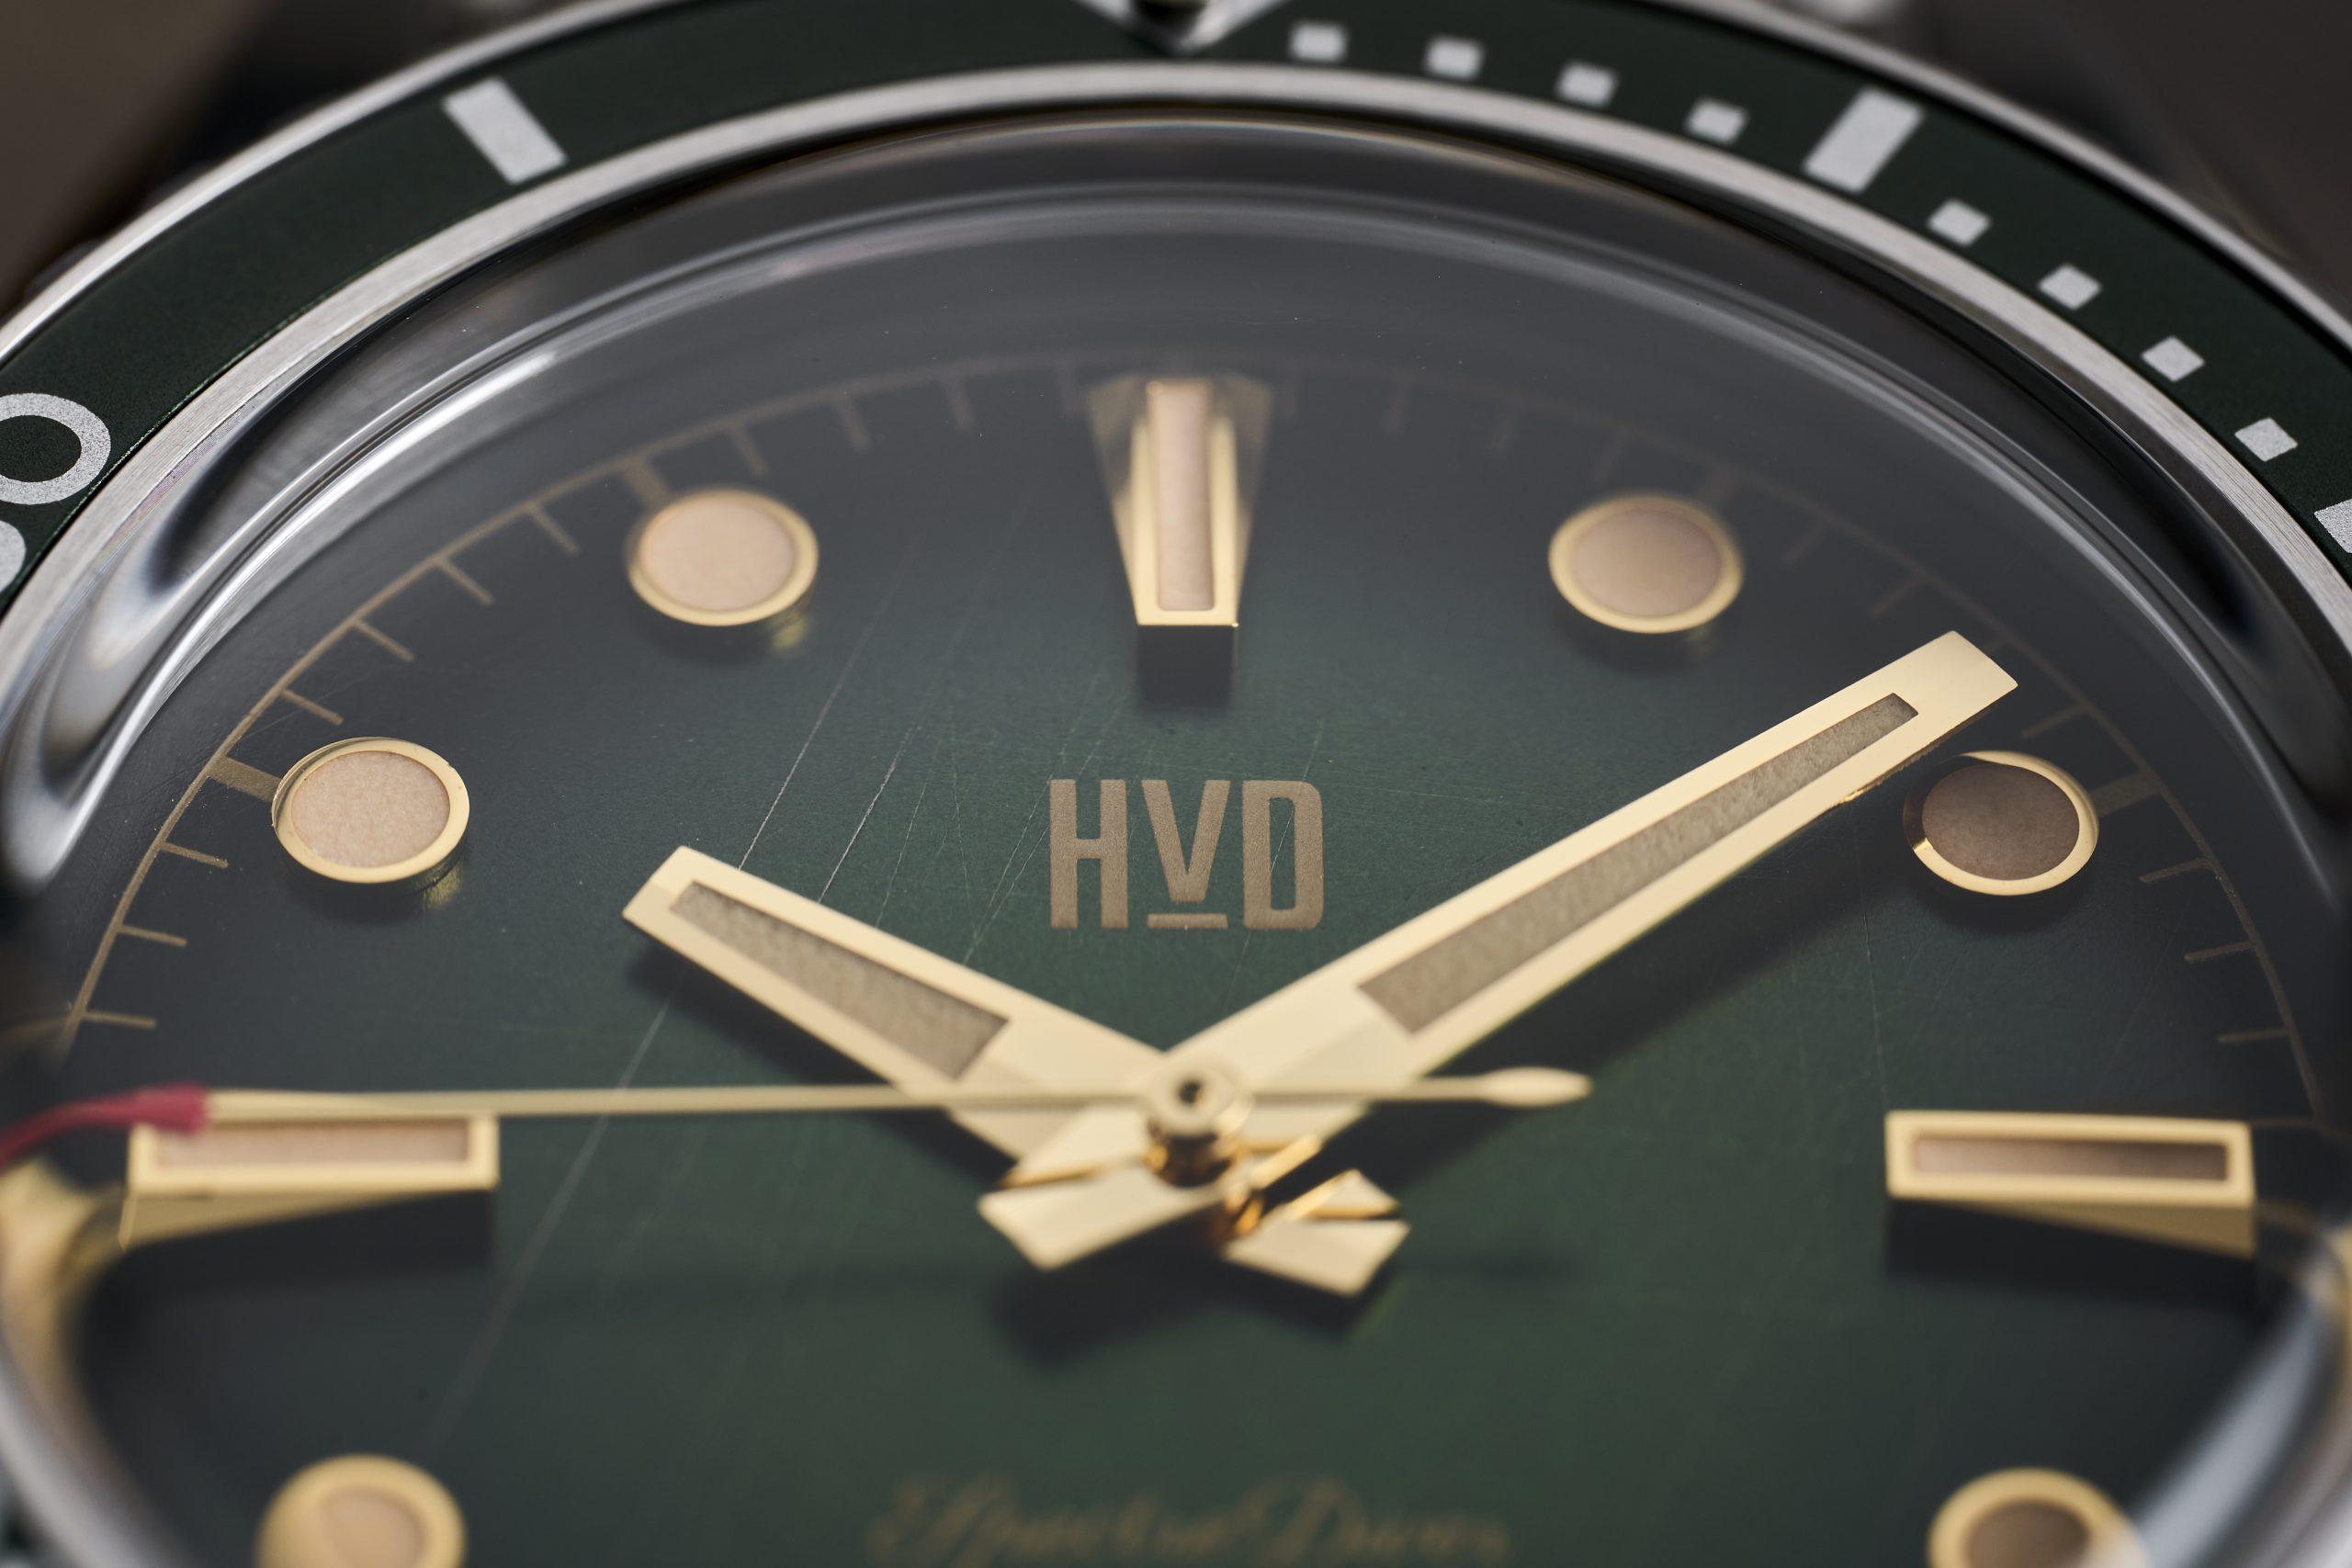 HVD Handwound Vintage Design Spectre Diver Review Emerald Green